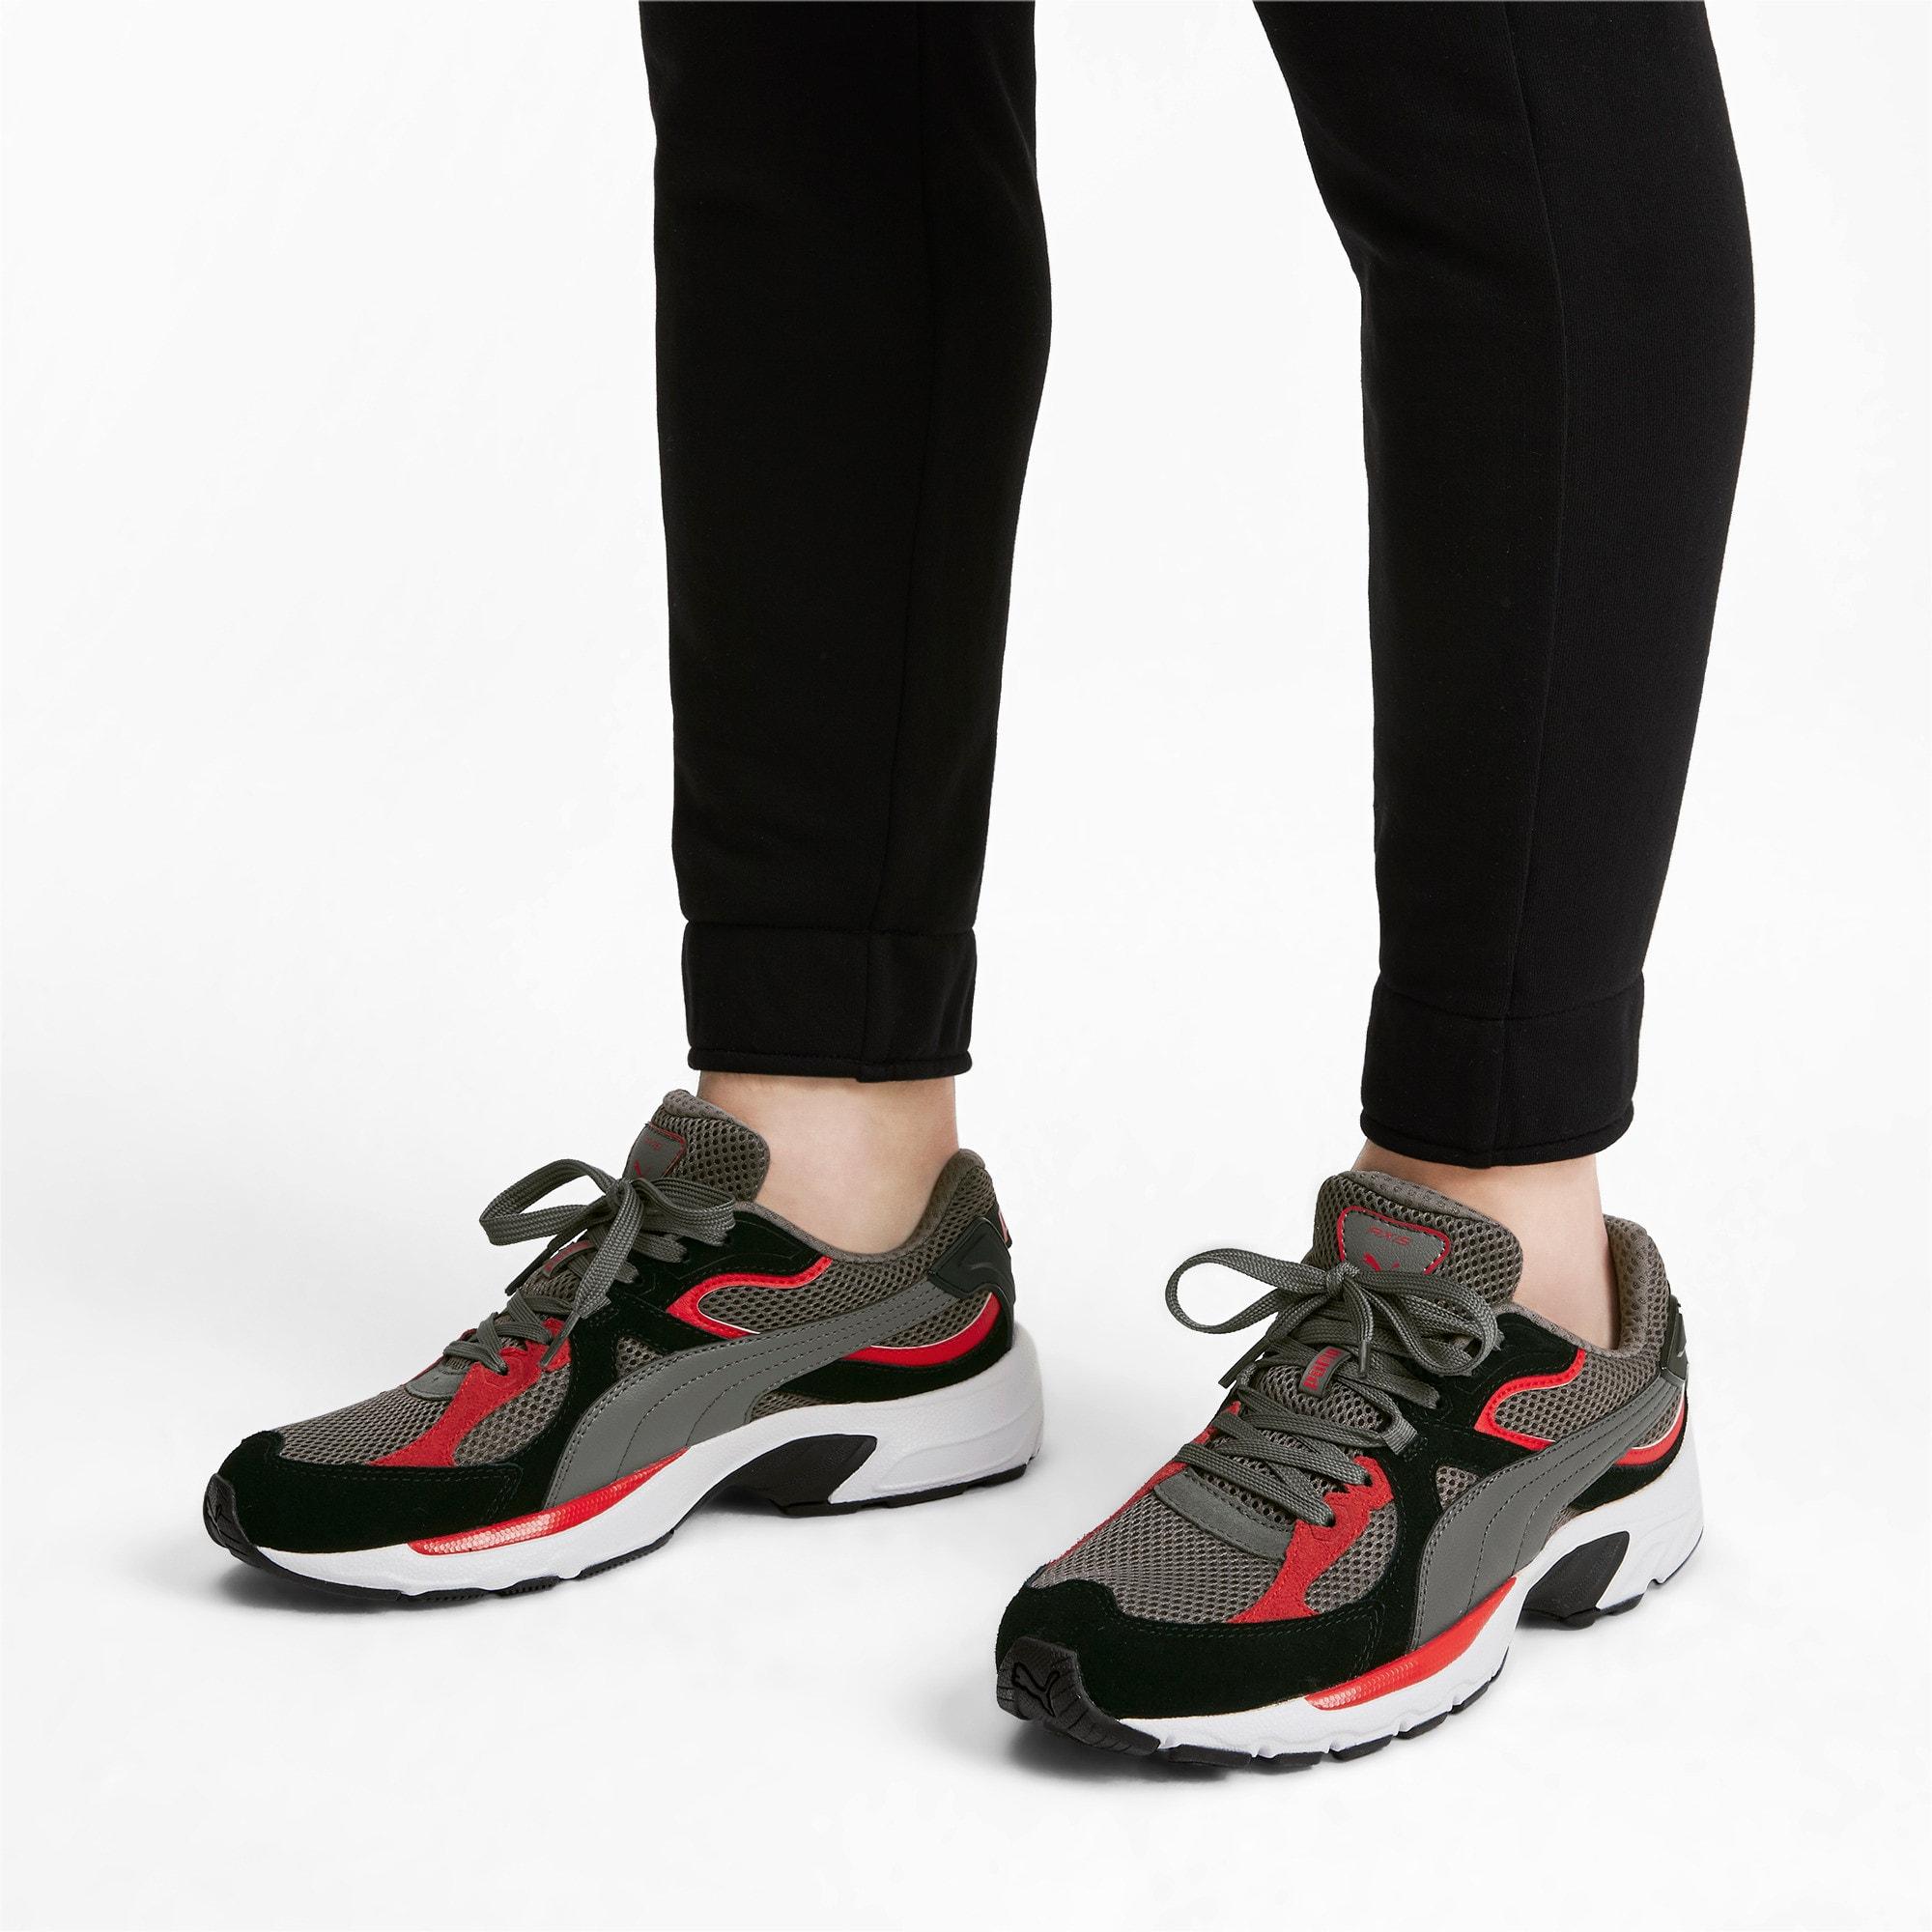 Thumbnail 2 of Axis Plus SD sneakers, CASTLEROCK-Black-Red-White, medium